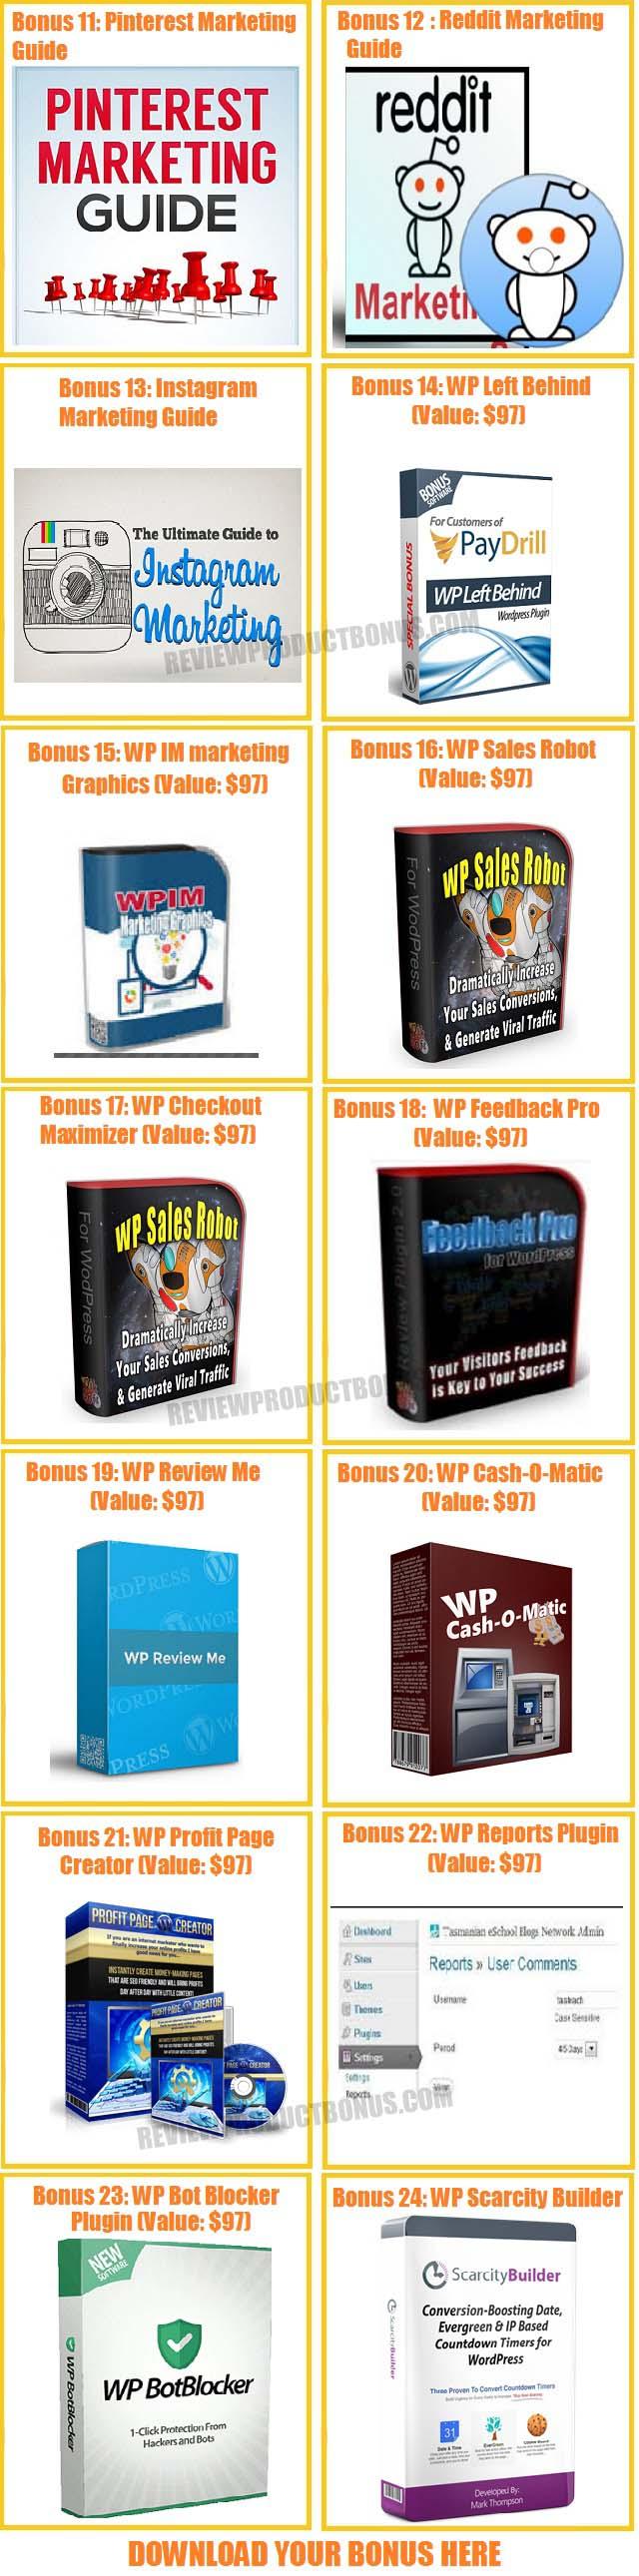 WP Tag Machine Bonuses